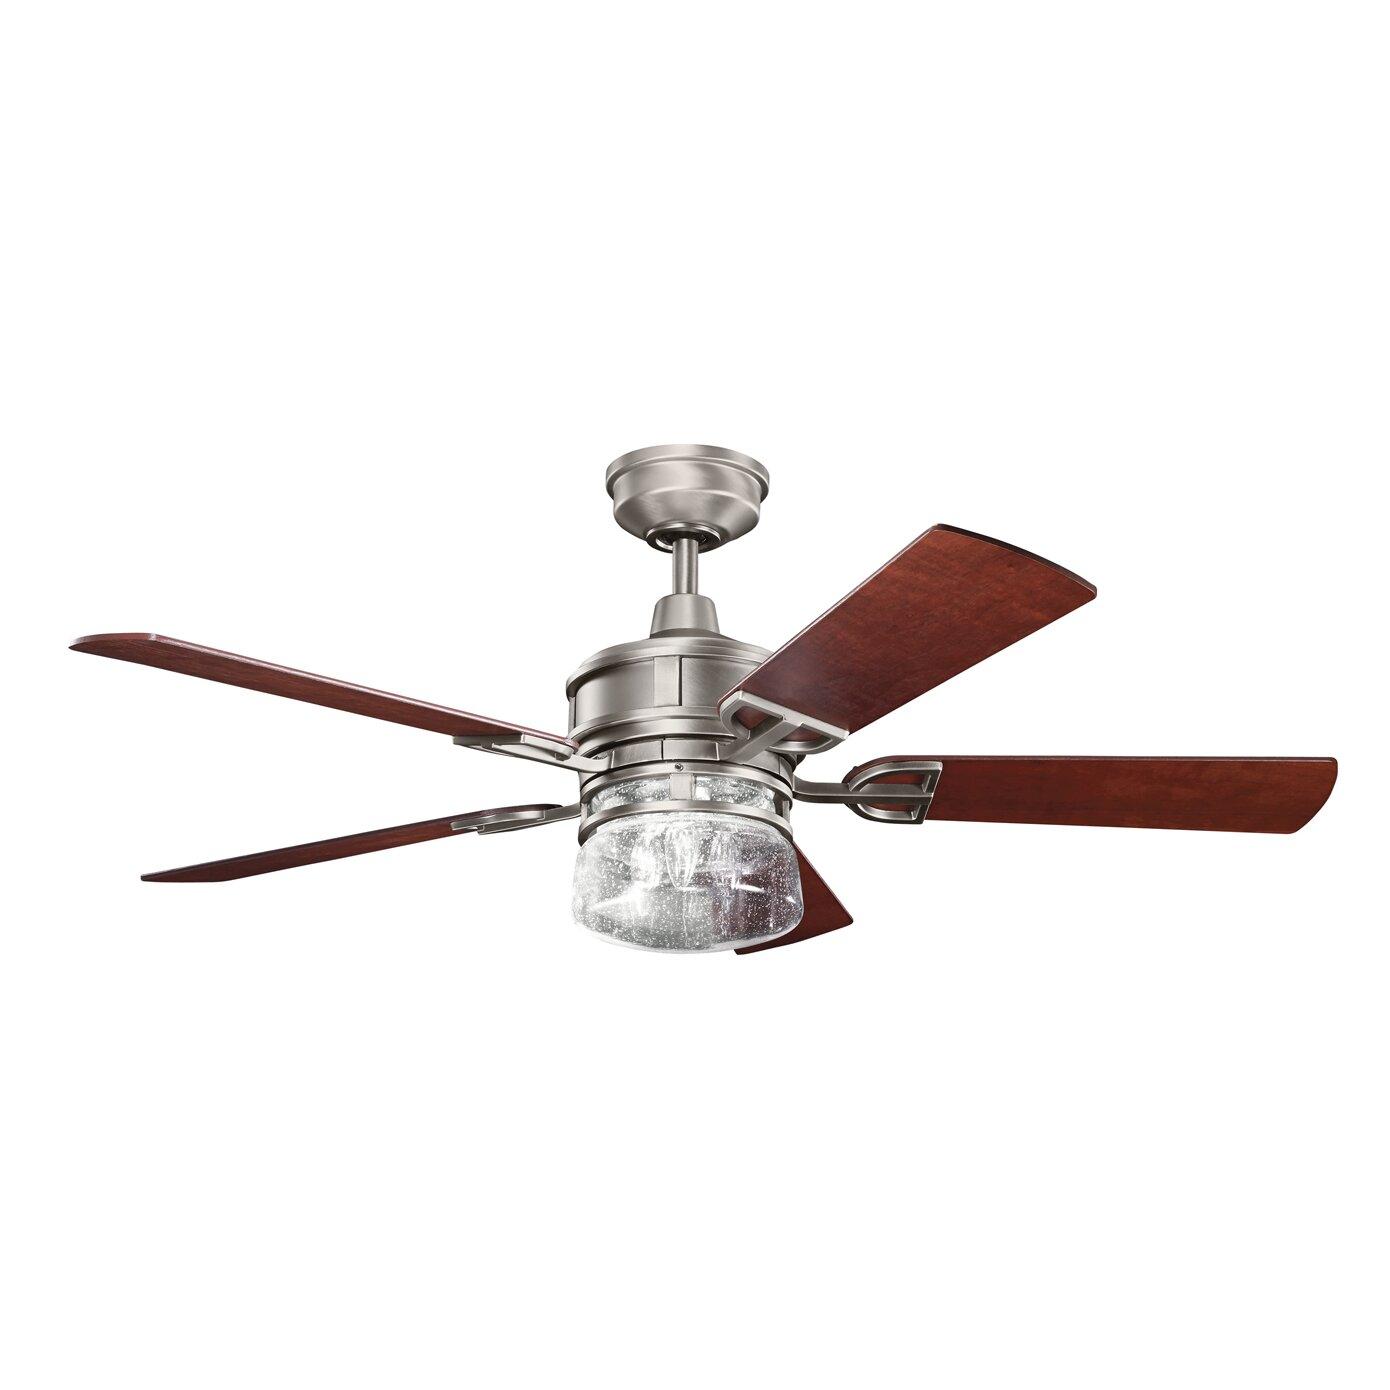 "Ceiling Fans Kichler: Kichler 52"" Lyndon 5 Blade Ceiling Fan & Reviews"